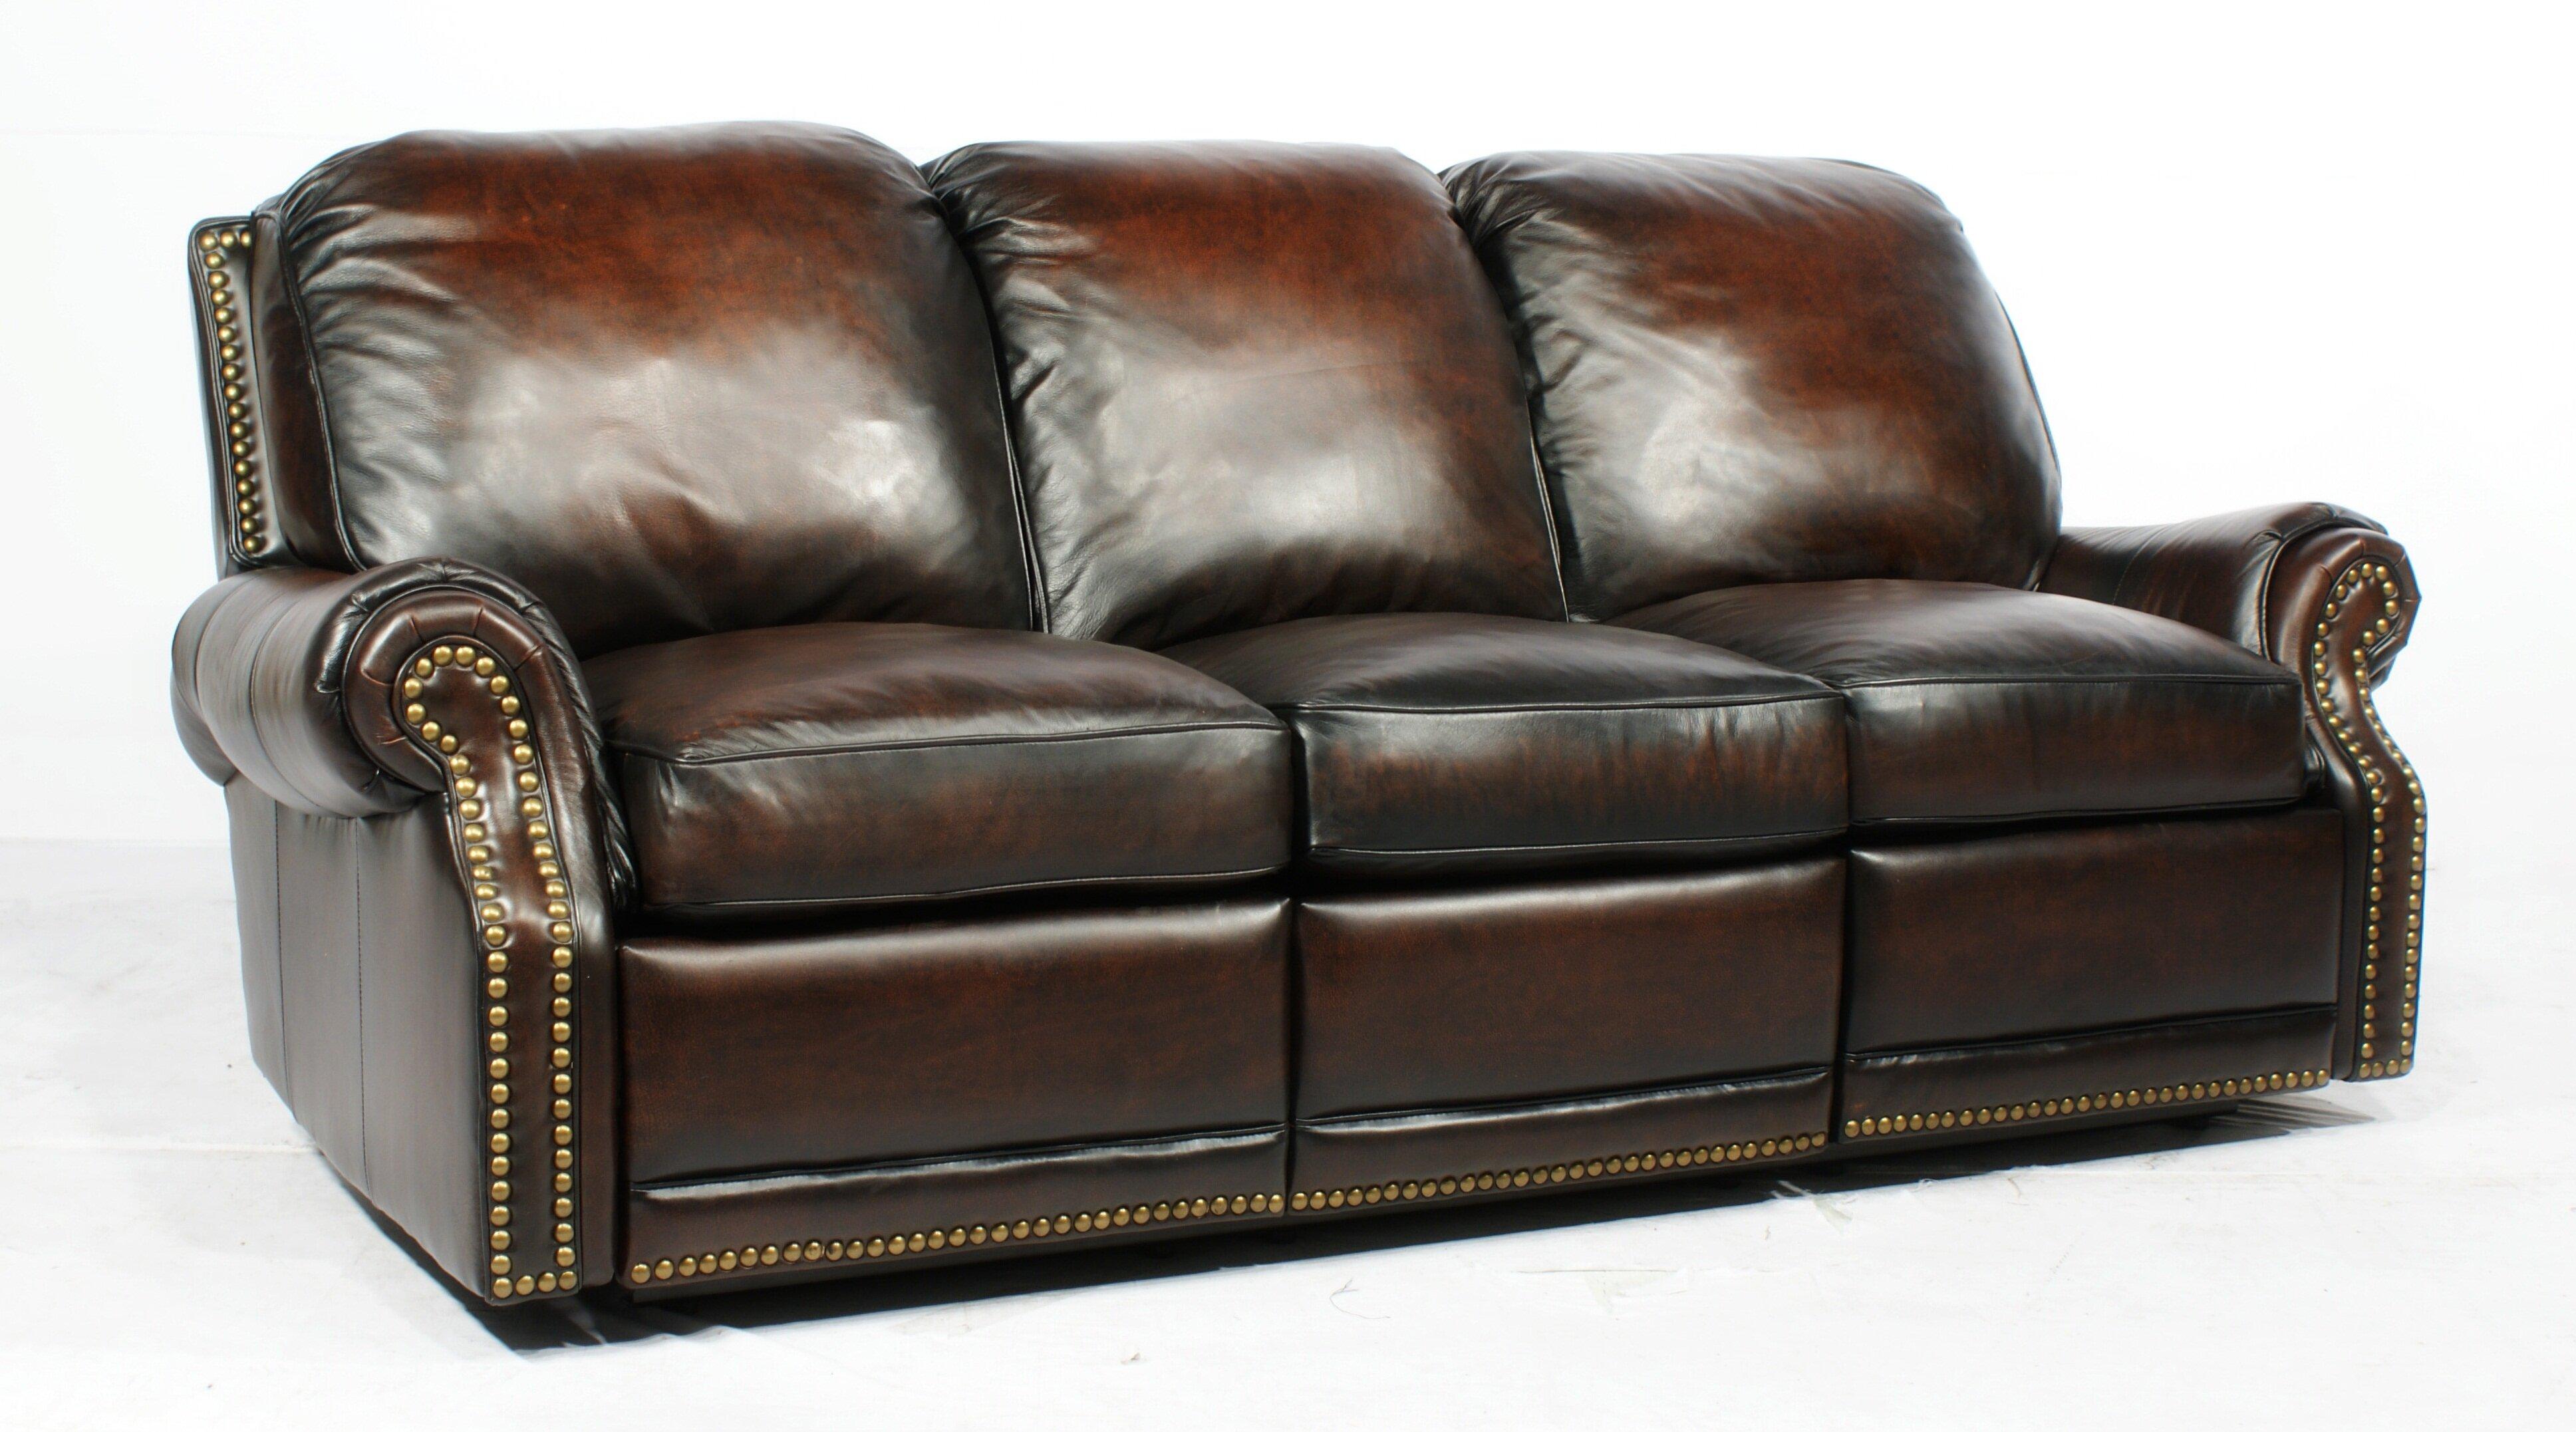 Awe Inspiring Italian Leather Sofa Recliner Wayfair Interior Design Ideas Tzicisoteloinfo